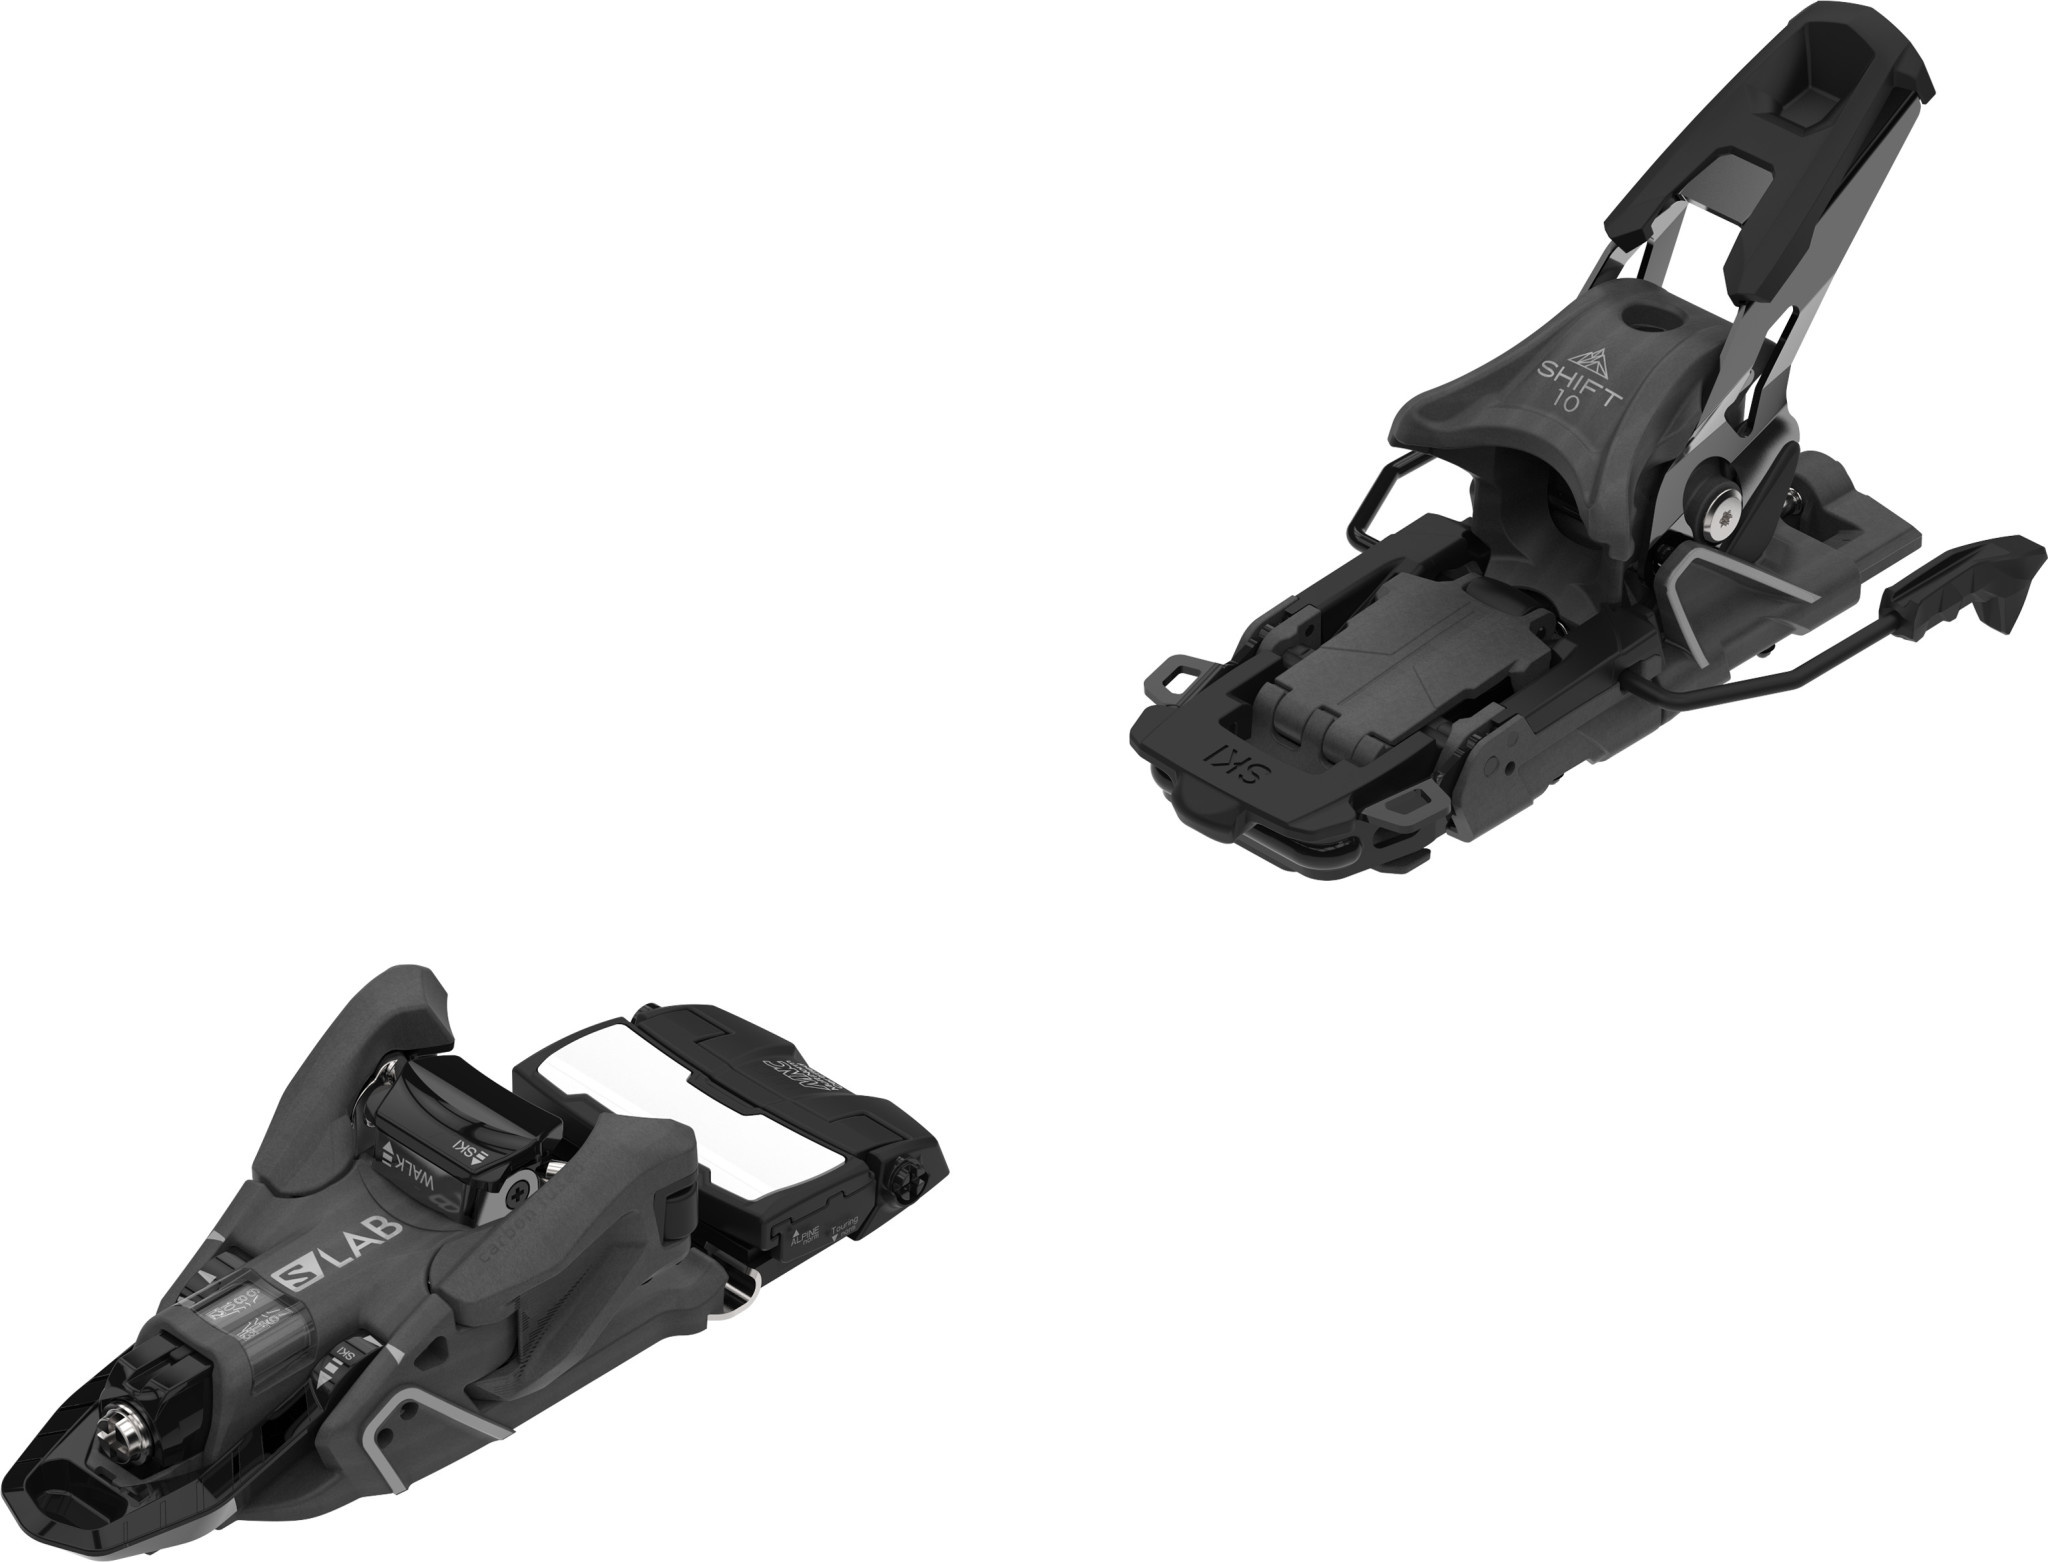 SALOMON Salomon S/Lab Shift MNC 10 Ski Binding (2021)